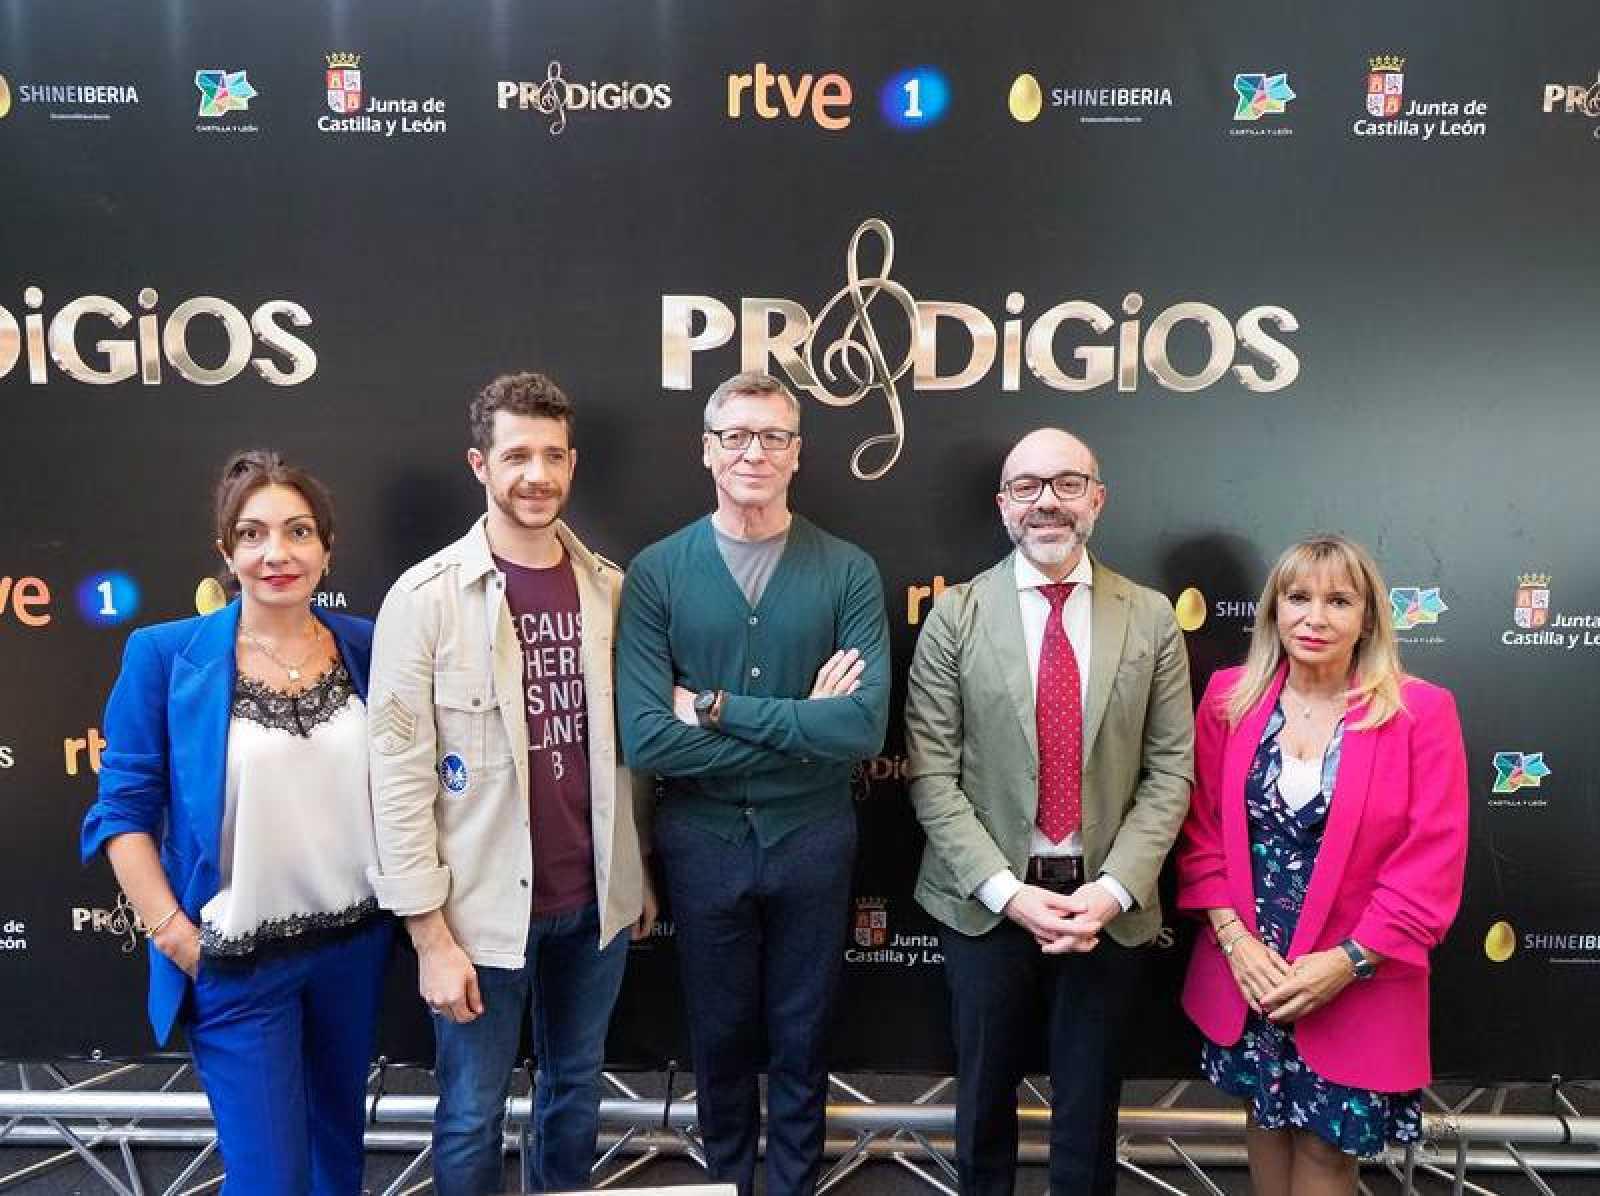 Ana Rivas, Andres Salado, Nacho Duato, Javier Ortega y Toñi Prieto